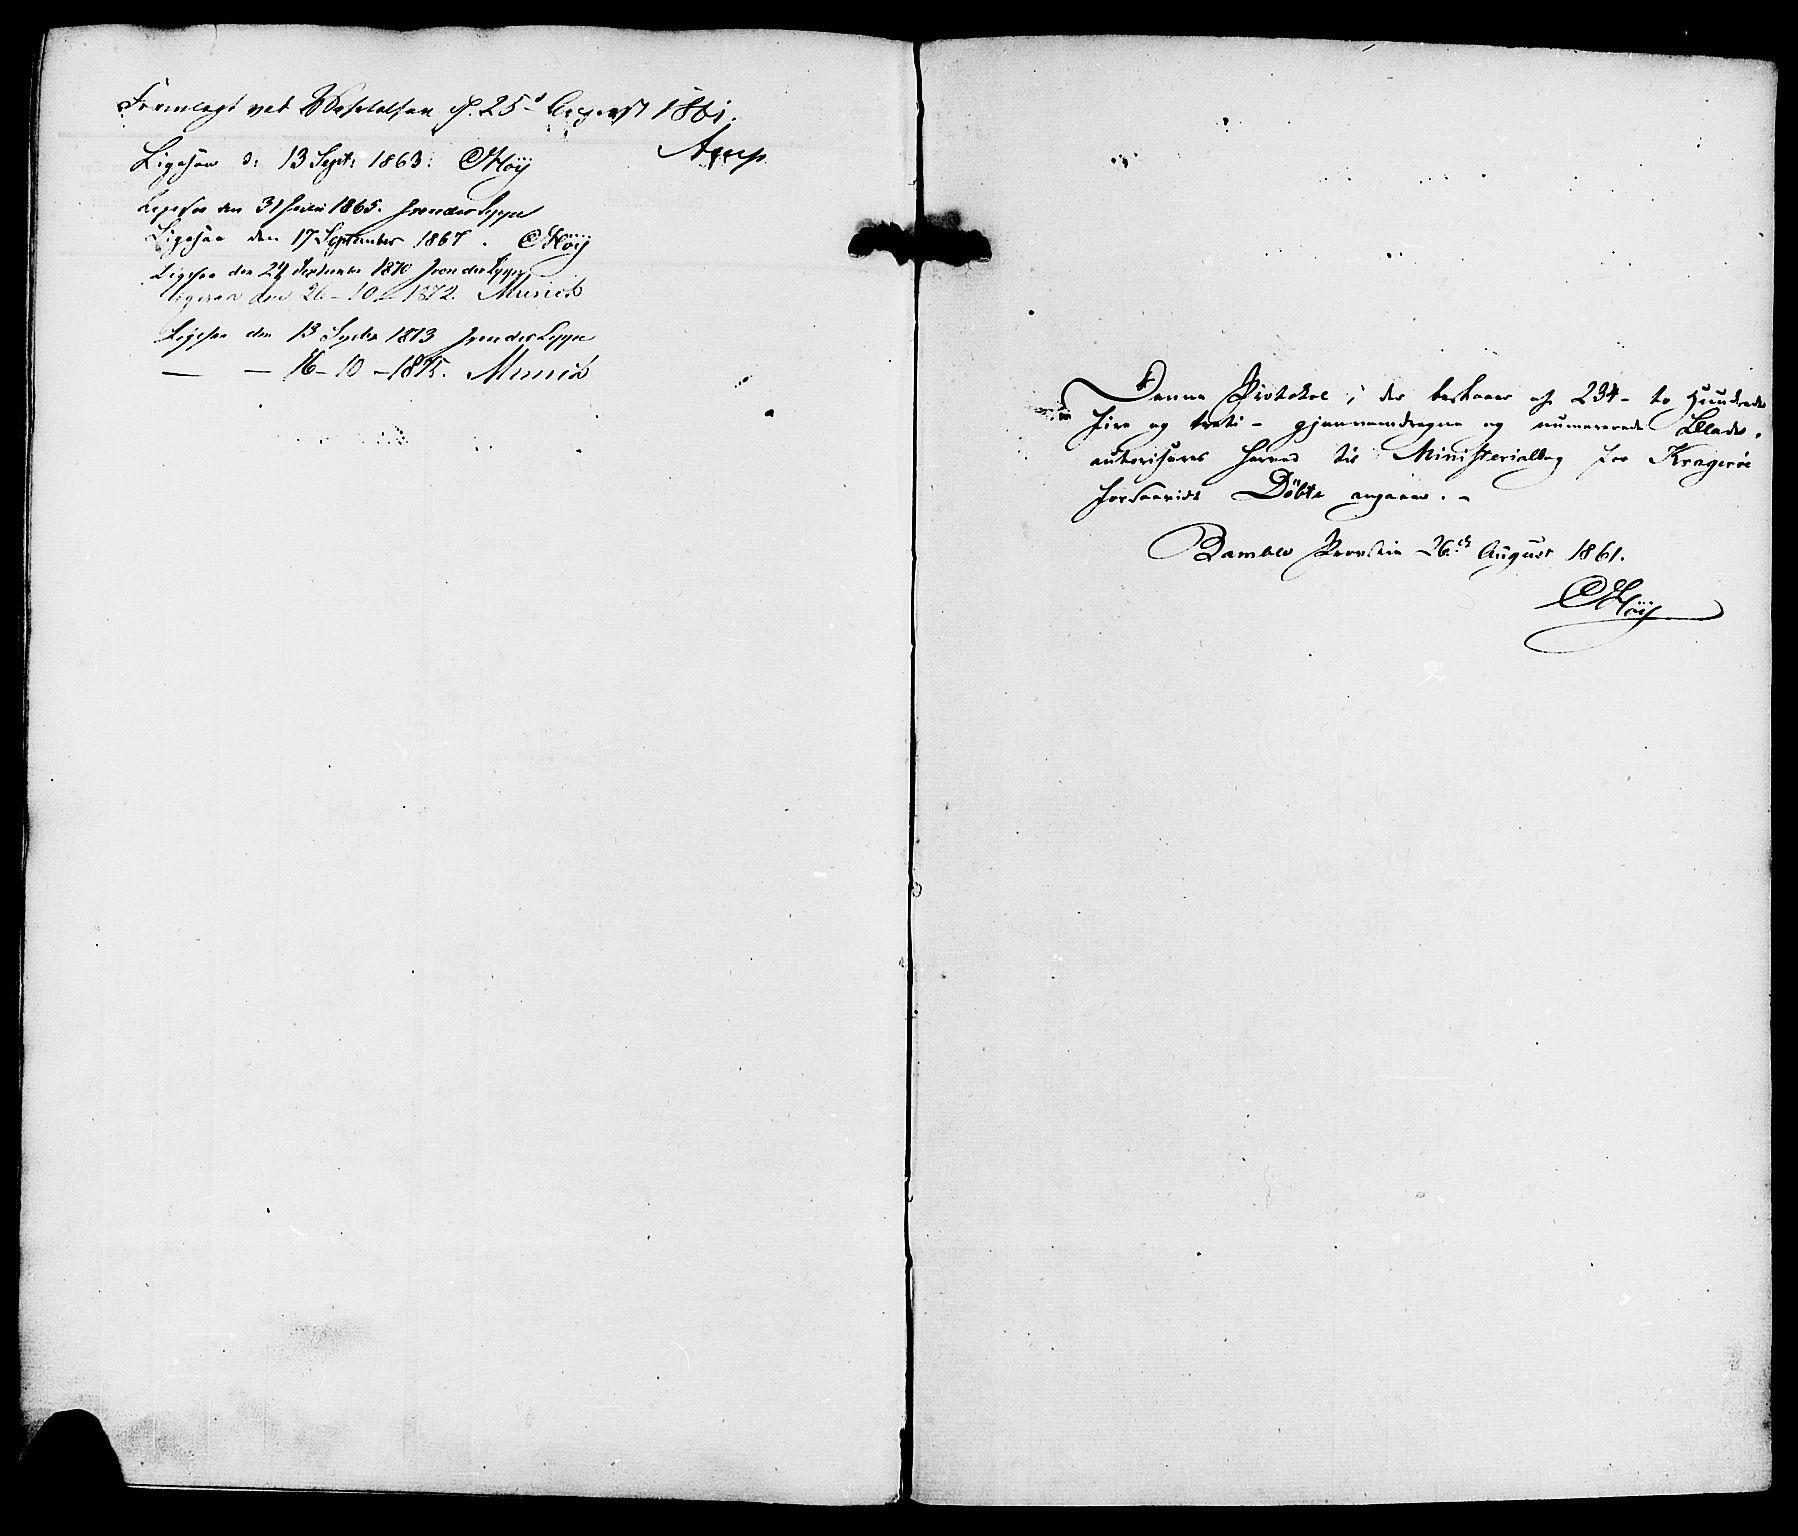 SAKO, Kragerø kirkebøker, F/Fa/L0007: Ministerialbok nr. 7, 1861-1875